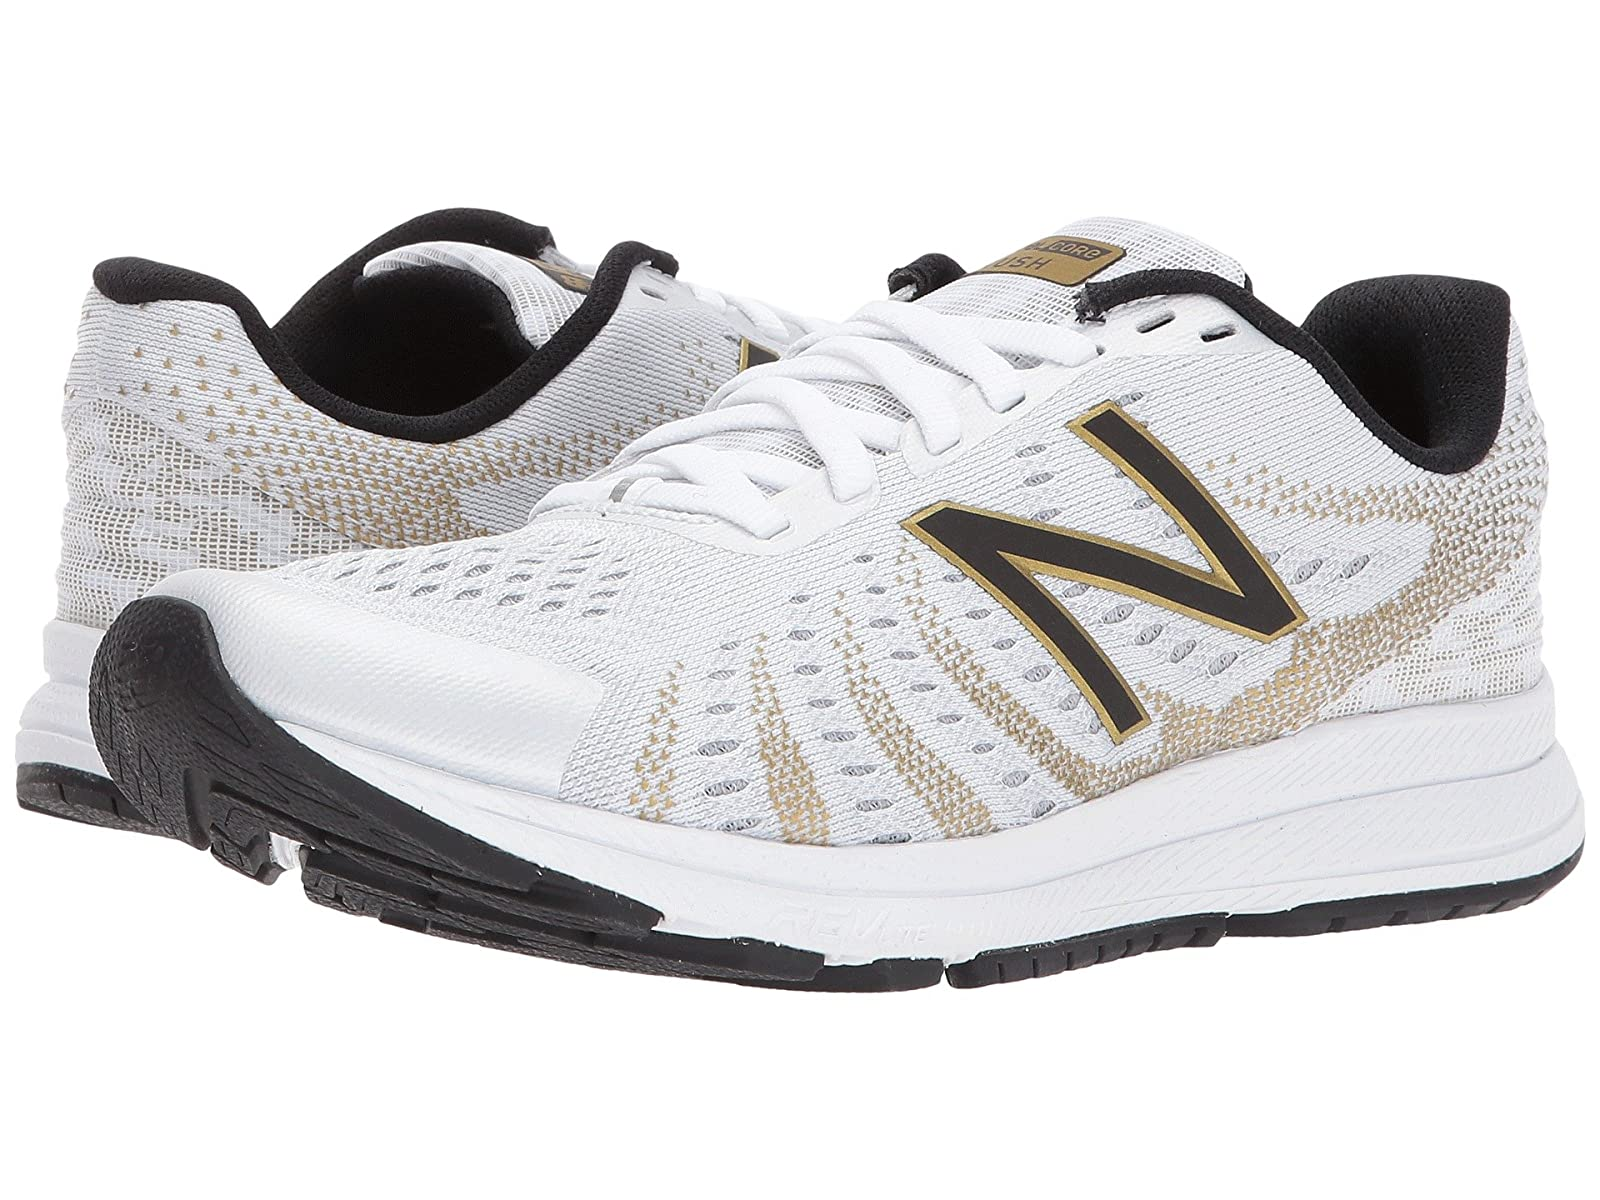 New Balance Rush V3Cheap and distinctive eye-catching shoes